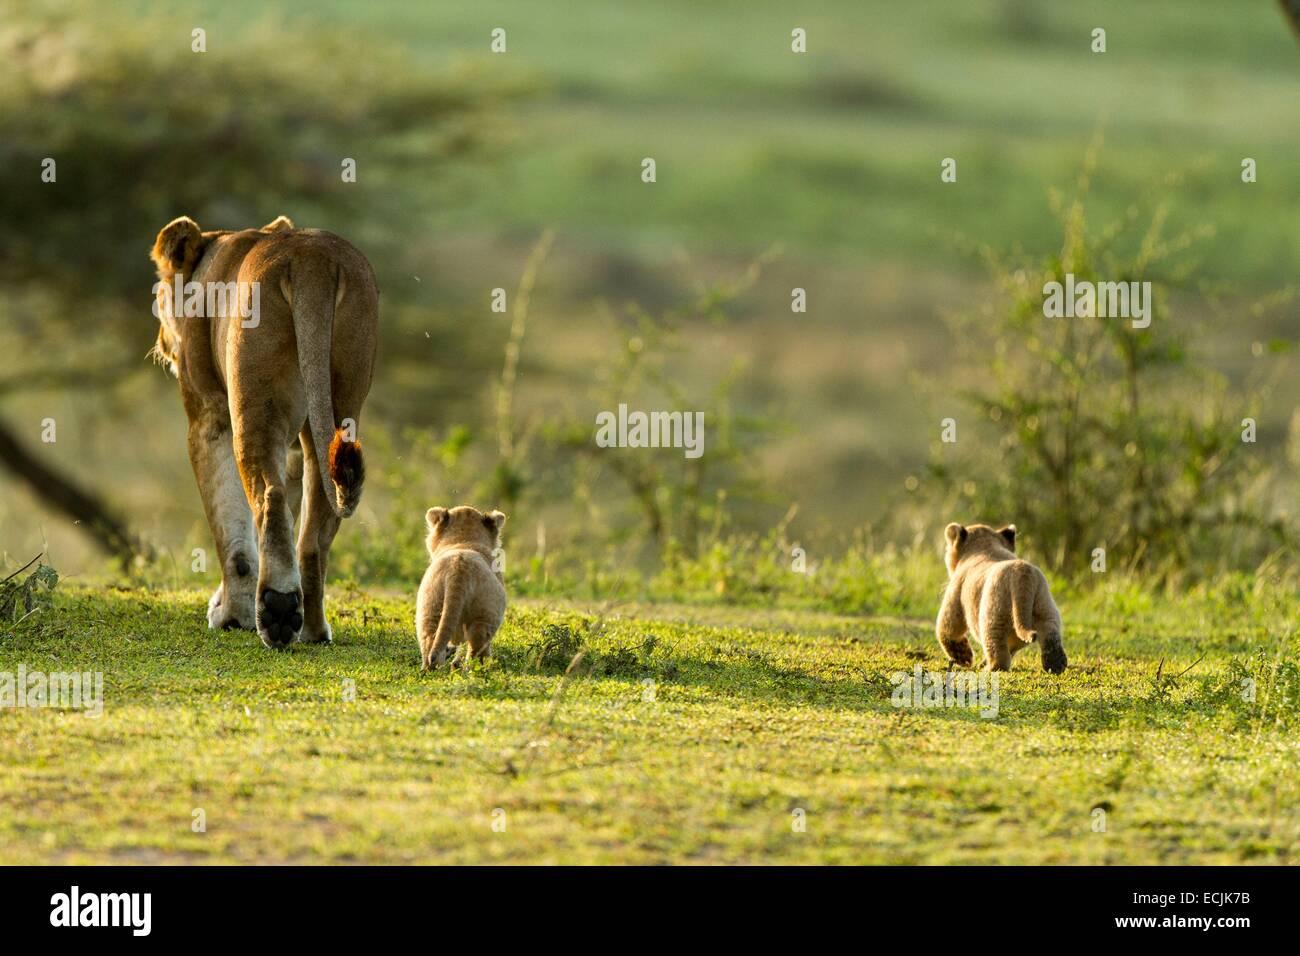 Tanzanie, Ngorongoro national park, lion (Panthera leo), a female and her babies - Stock Image